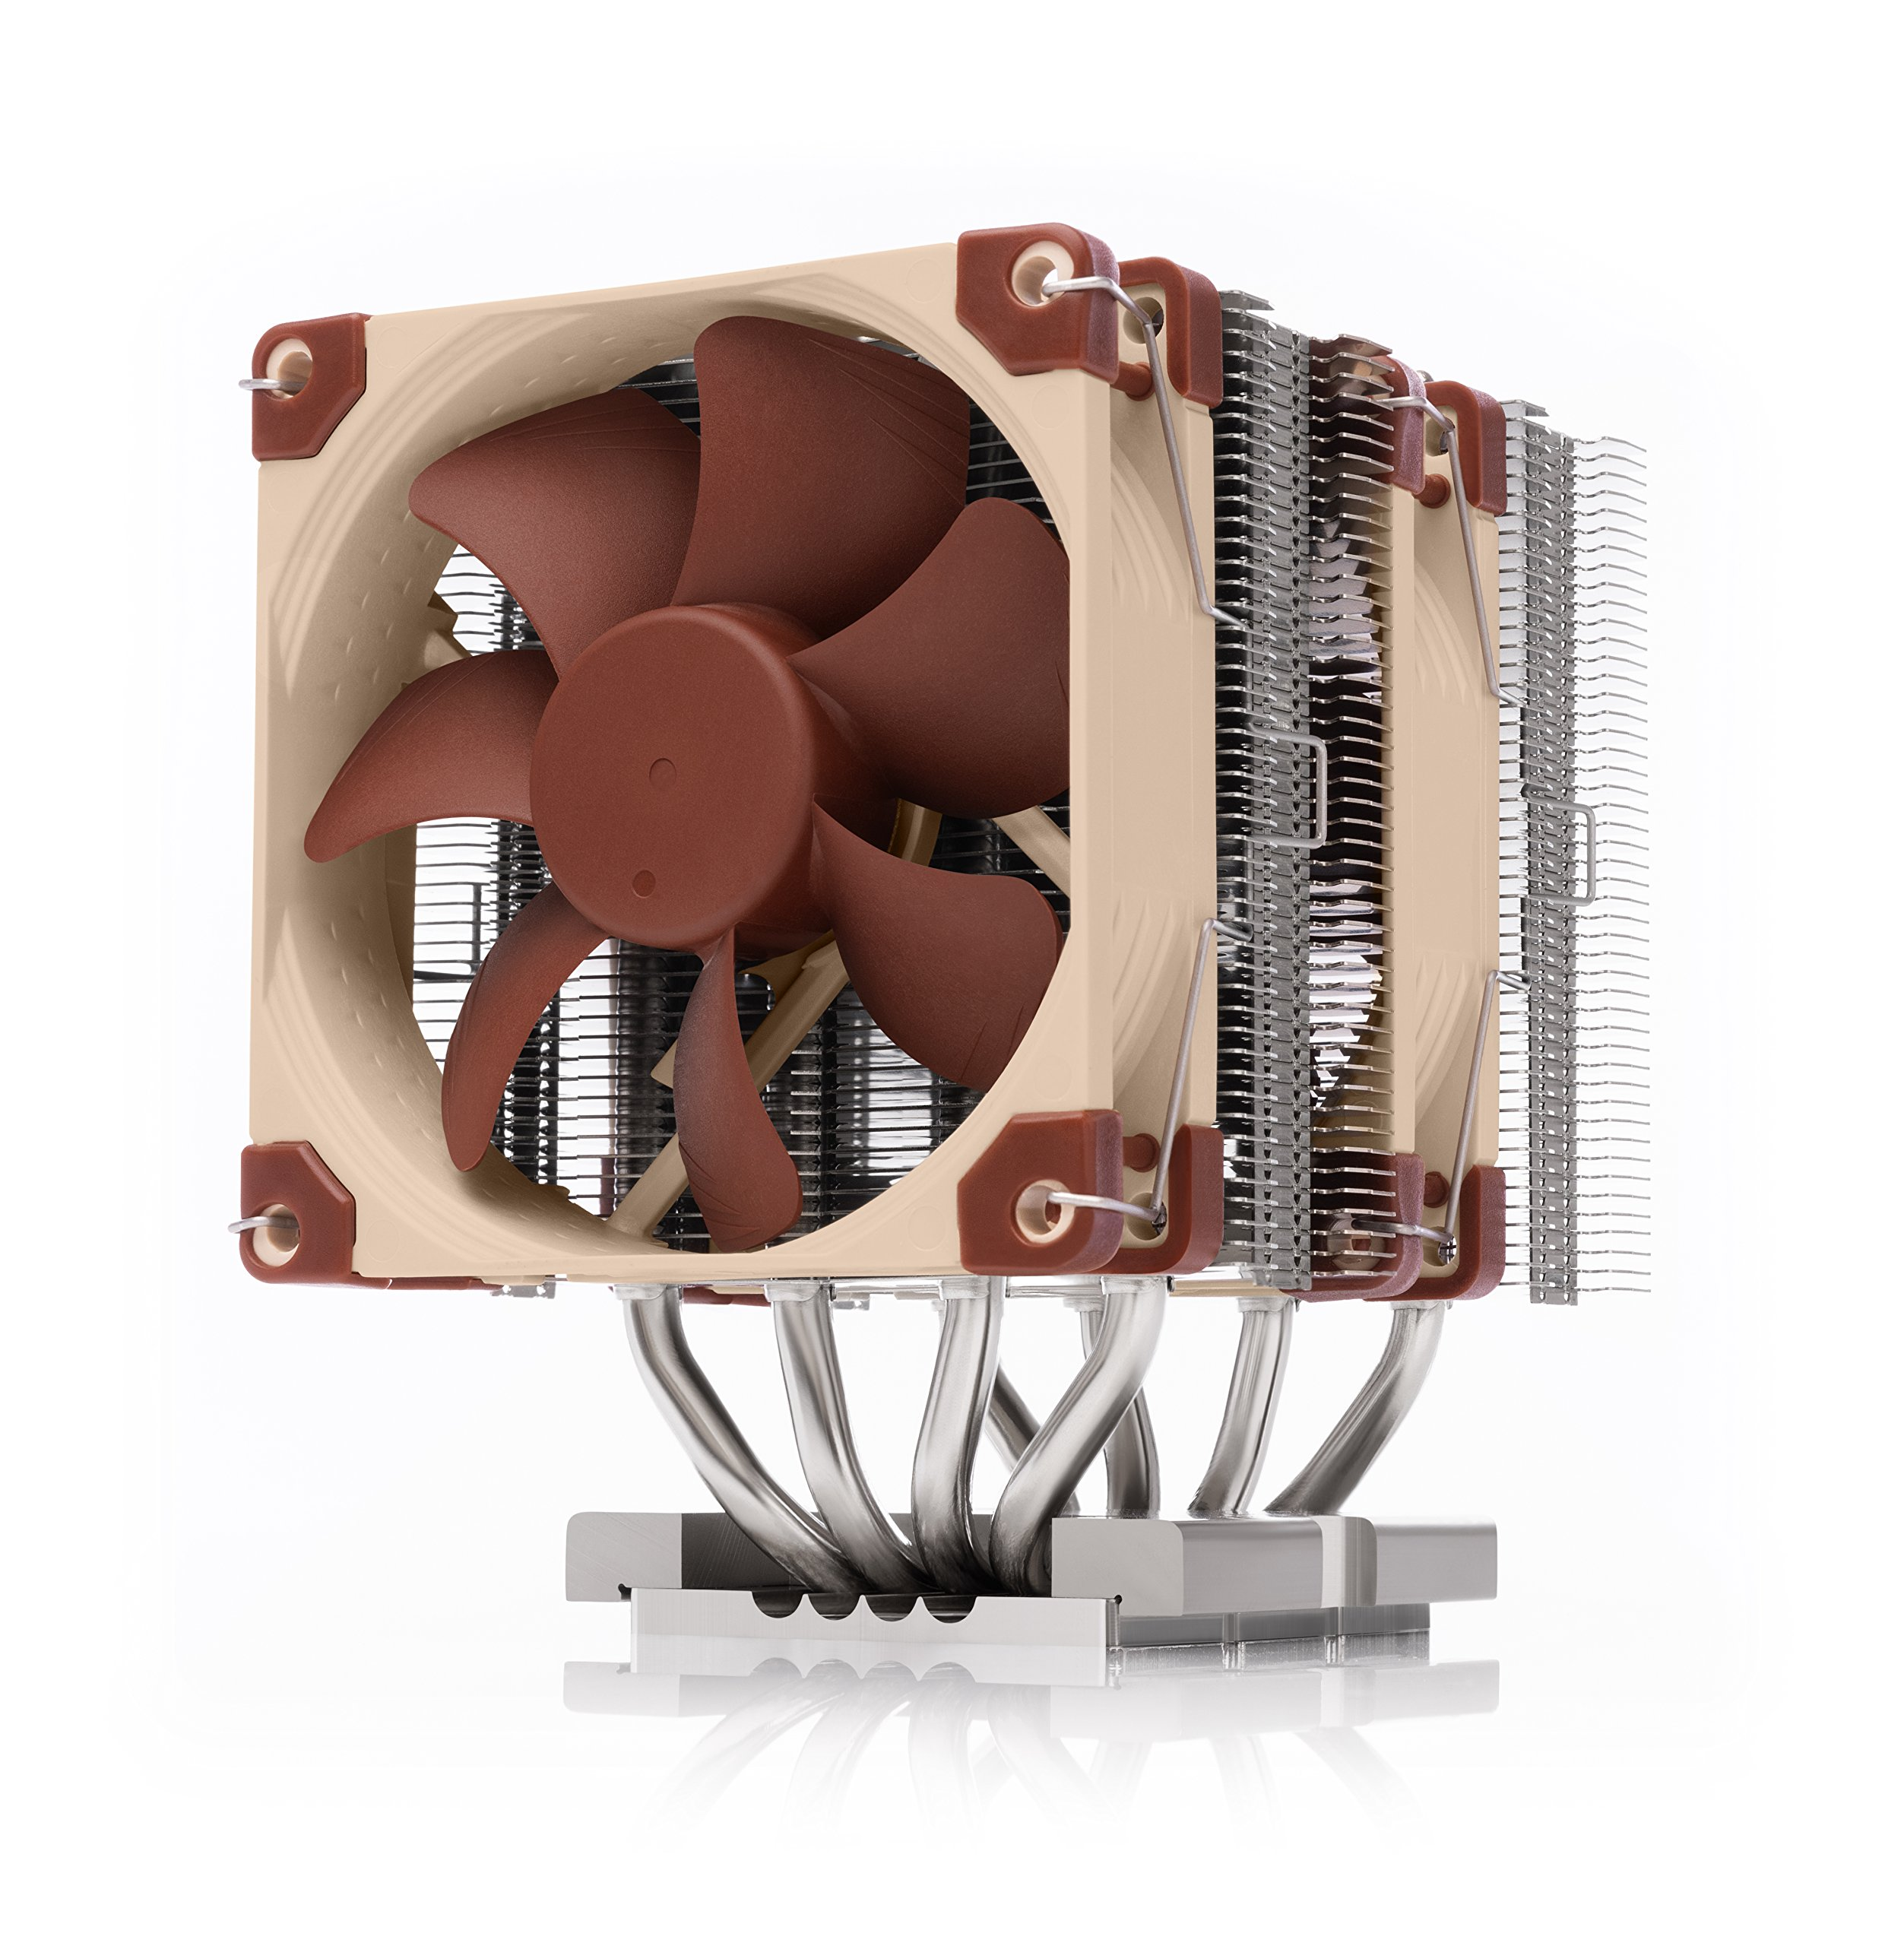 Noctua NH-D9 DX-3647 4U Premium Quality Quiet 92mm CPU Cooler for Intel Xeon LGA3647